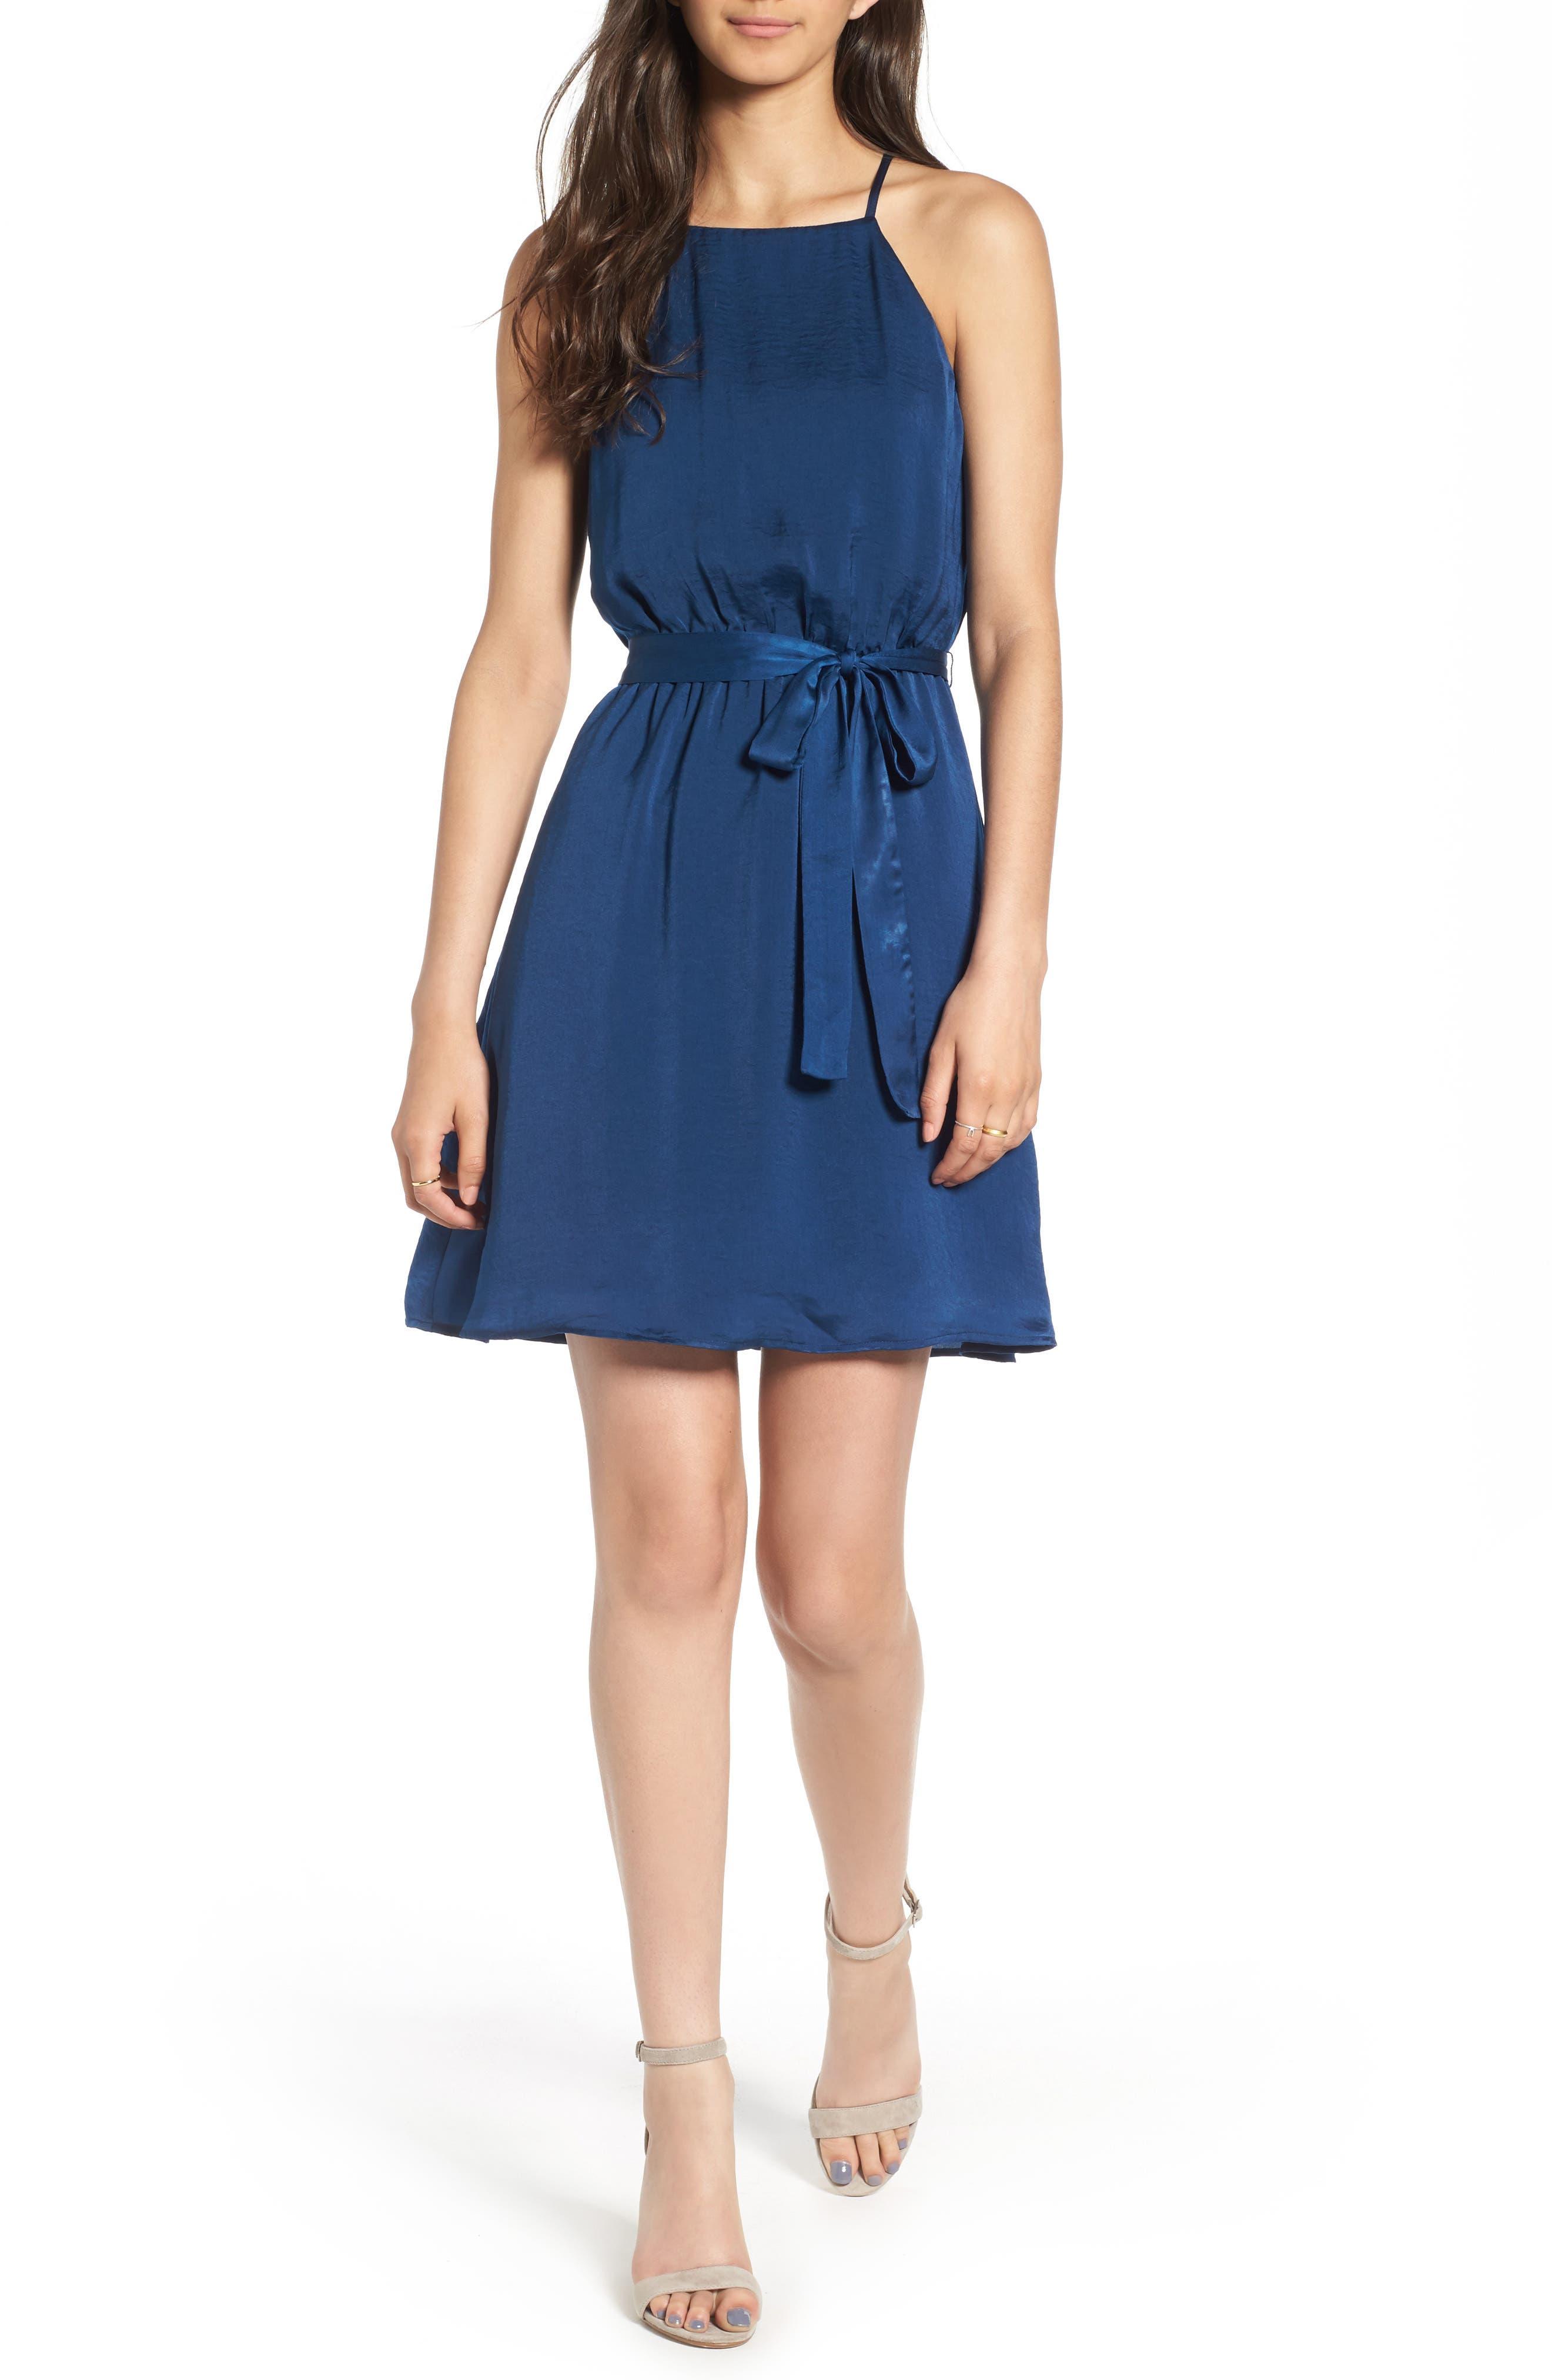 As You Wish Tie Waist Dress,                             Main thumbnail 1, color,                             400